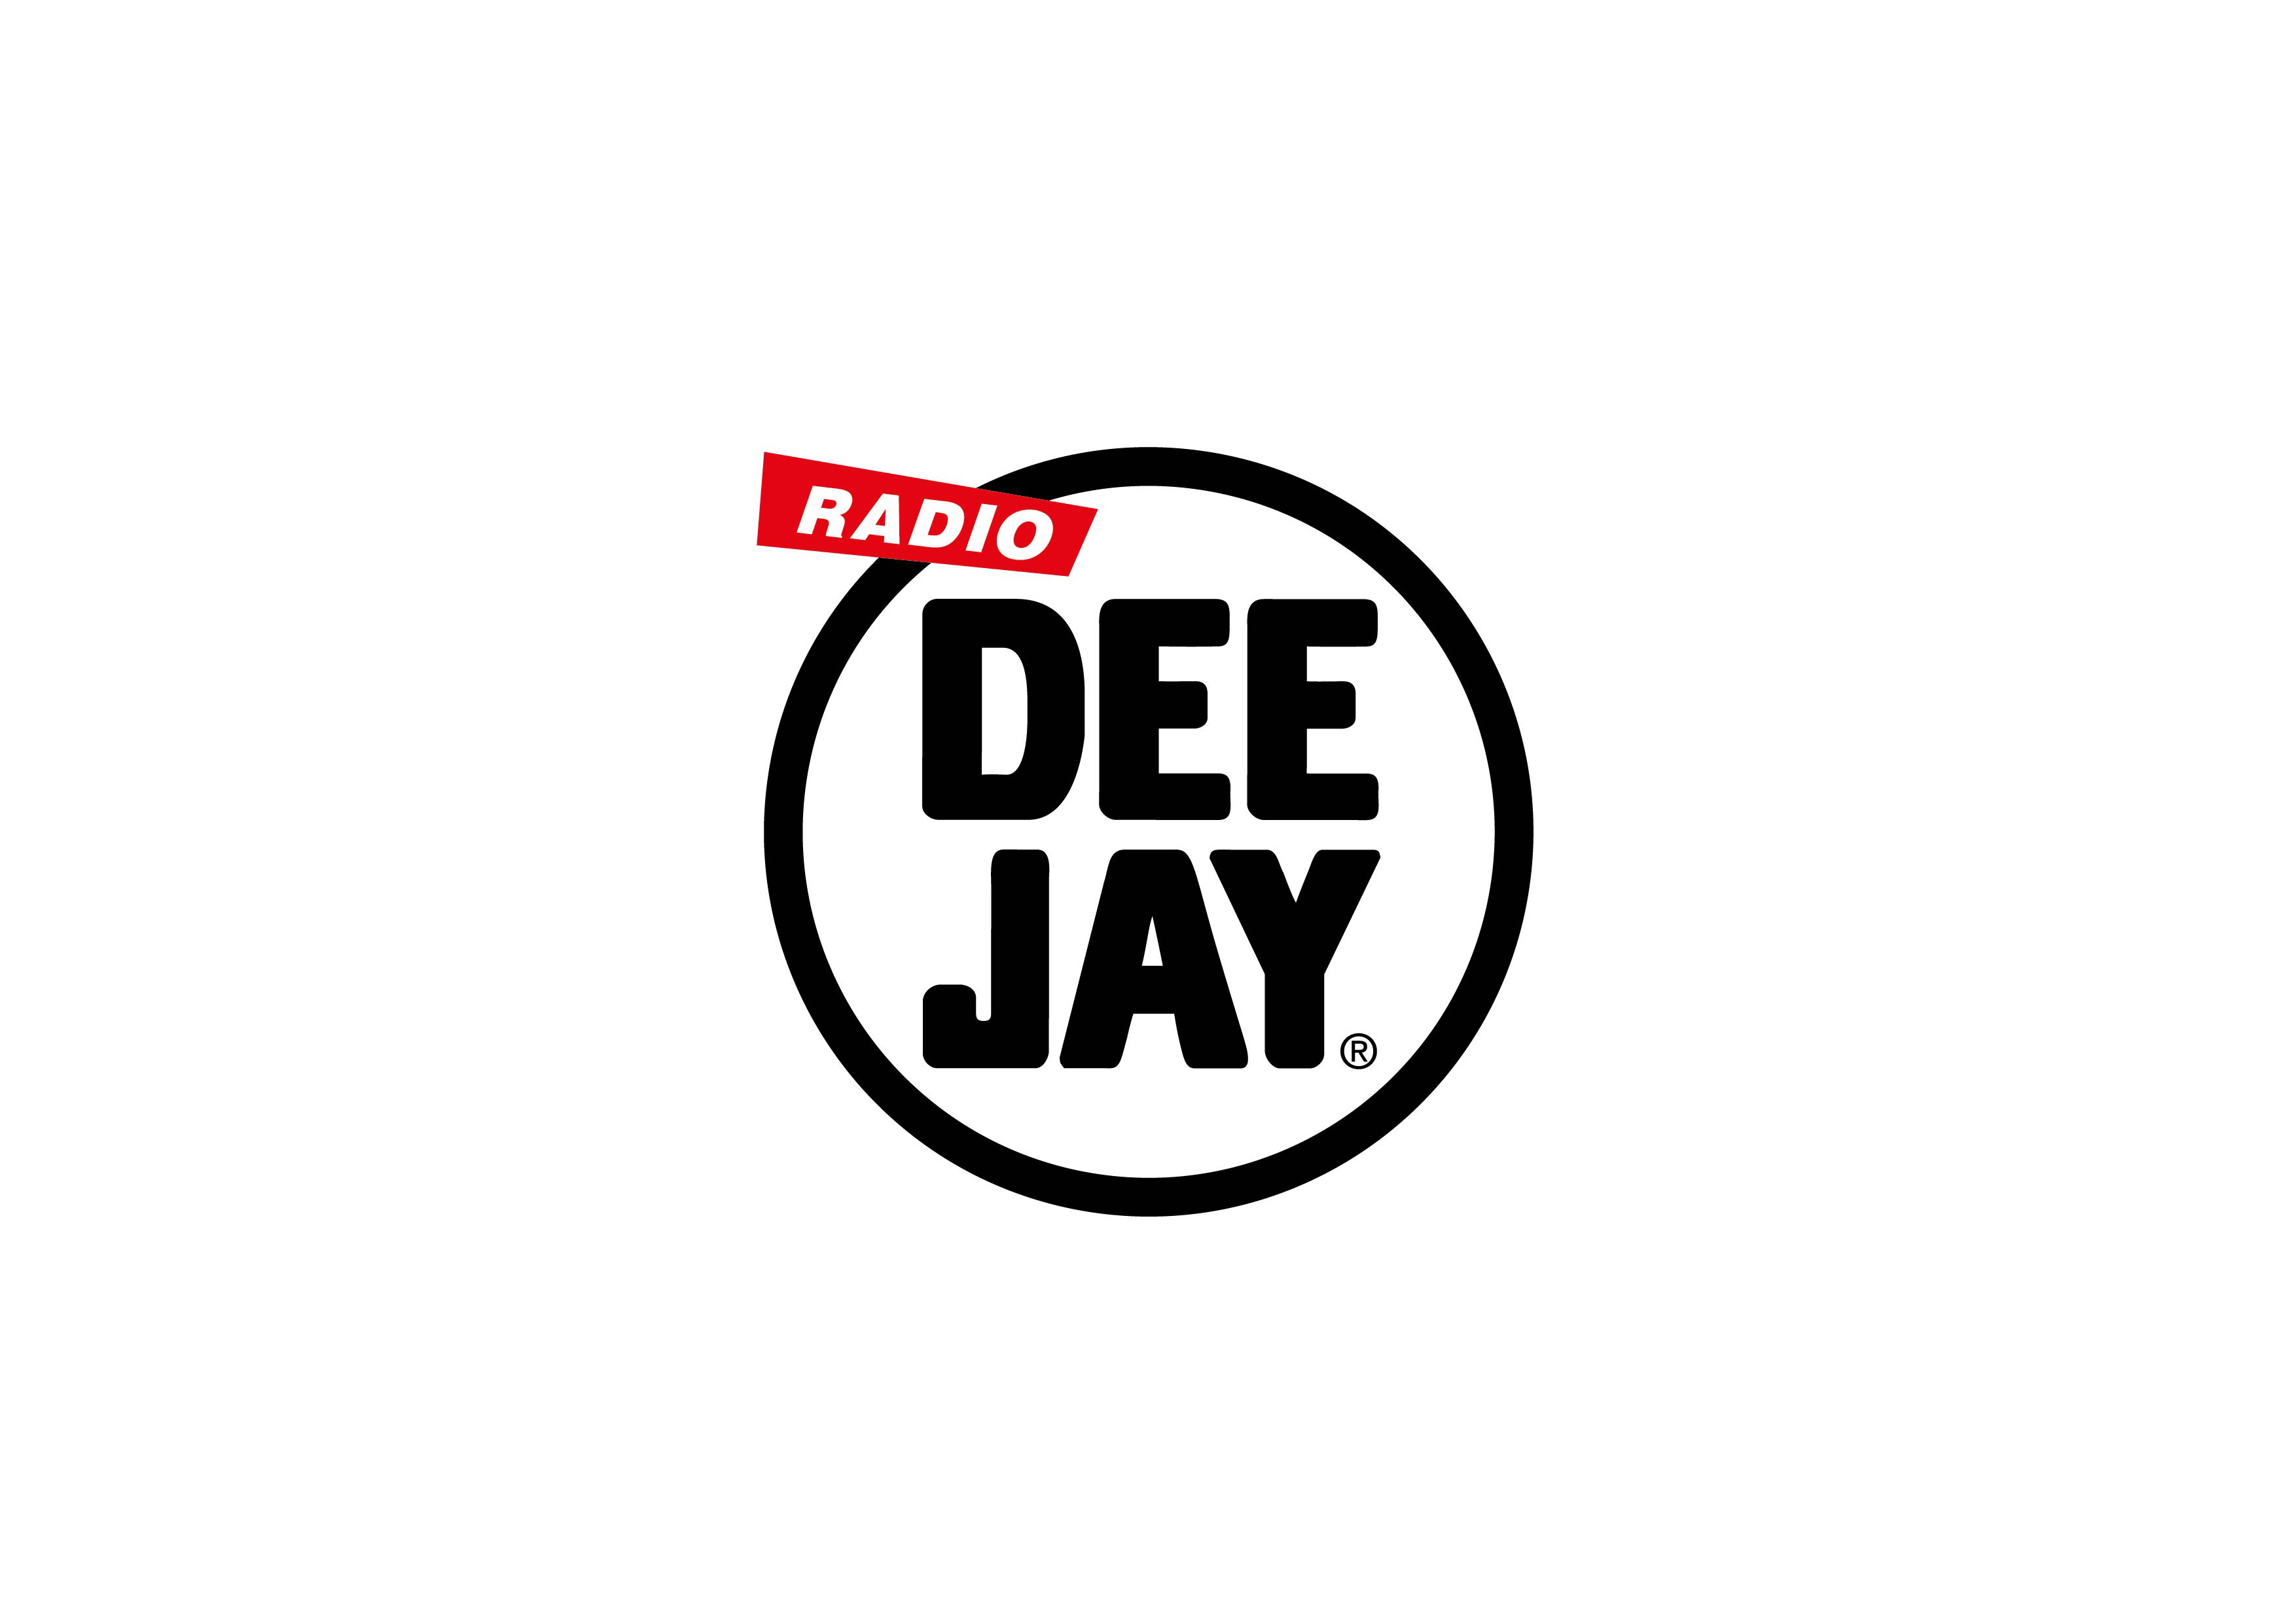 Deejay_1